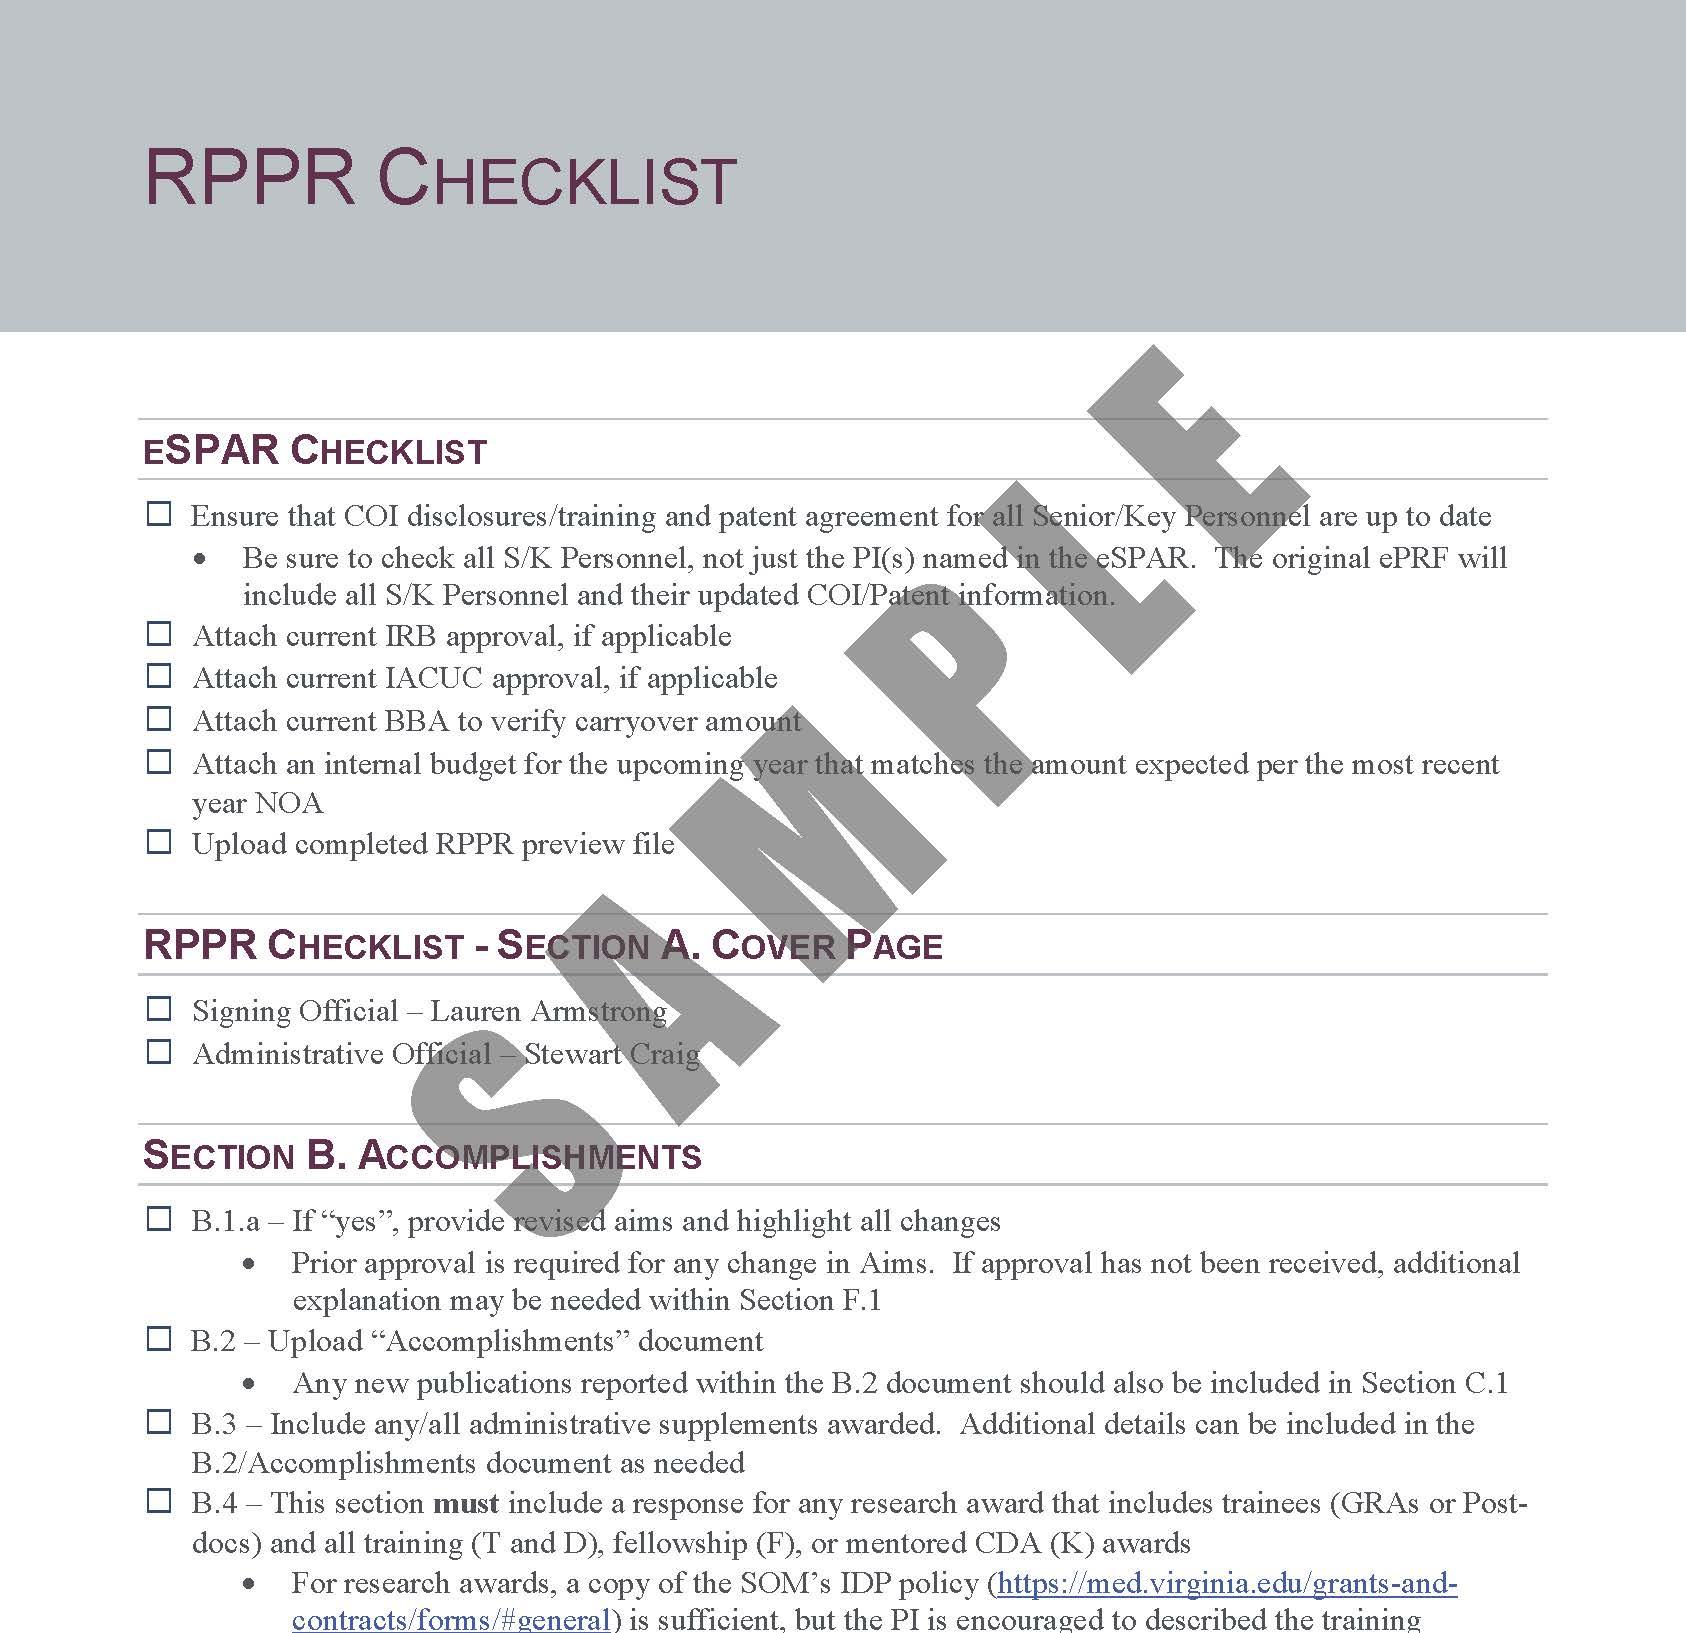 RPPR Checklist